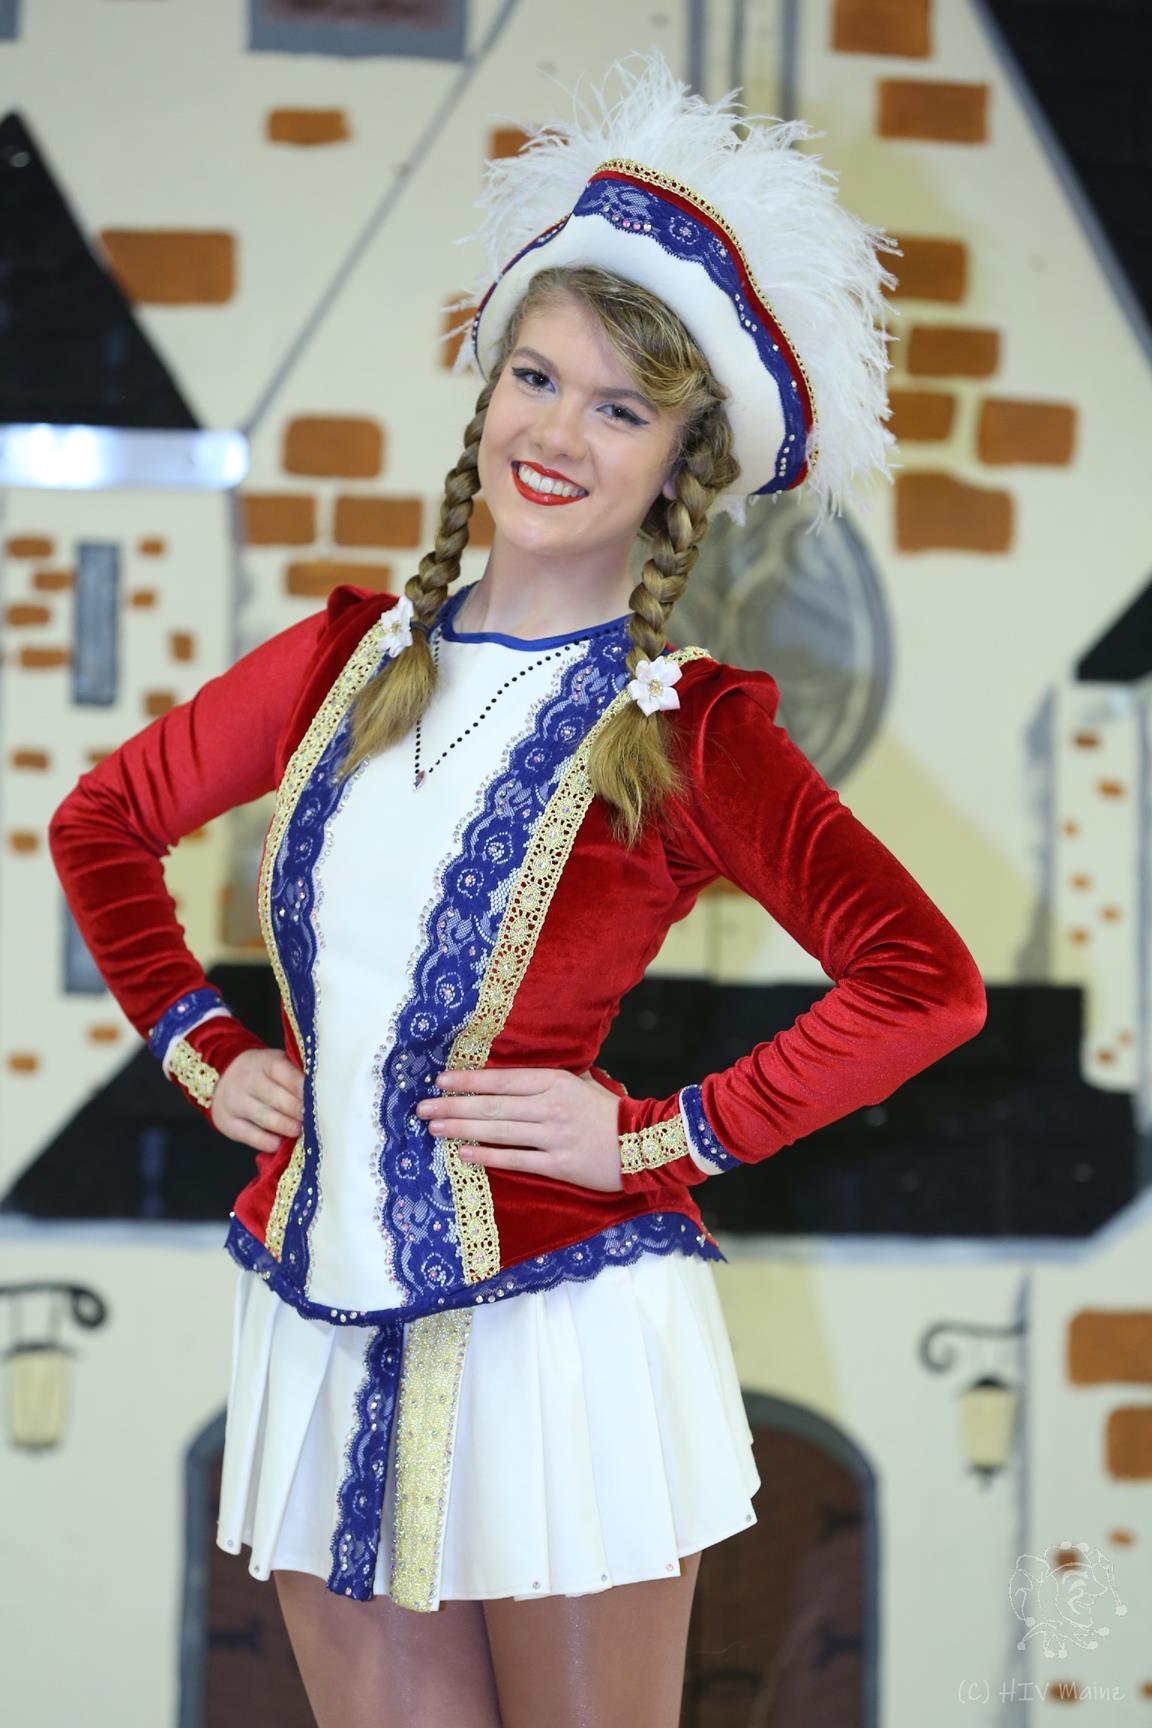 Marina_Pingen,KG-Vicht,Karneval,Stolberg,Tanzen